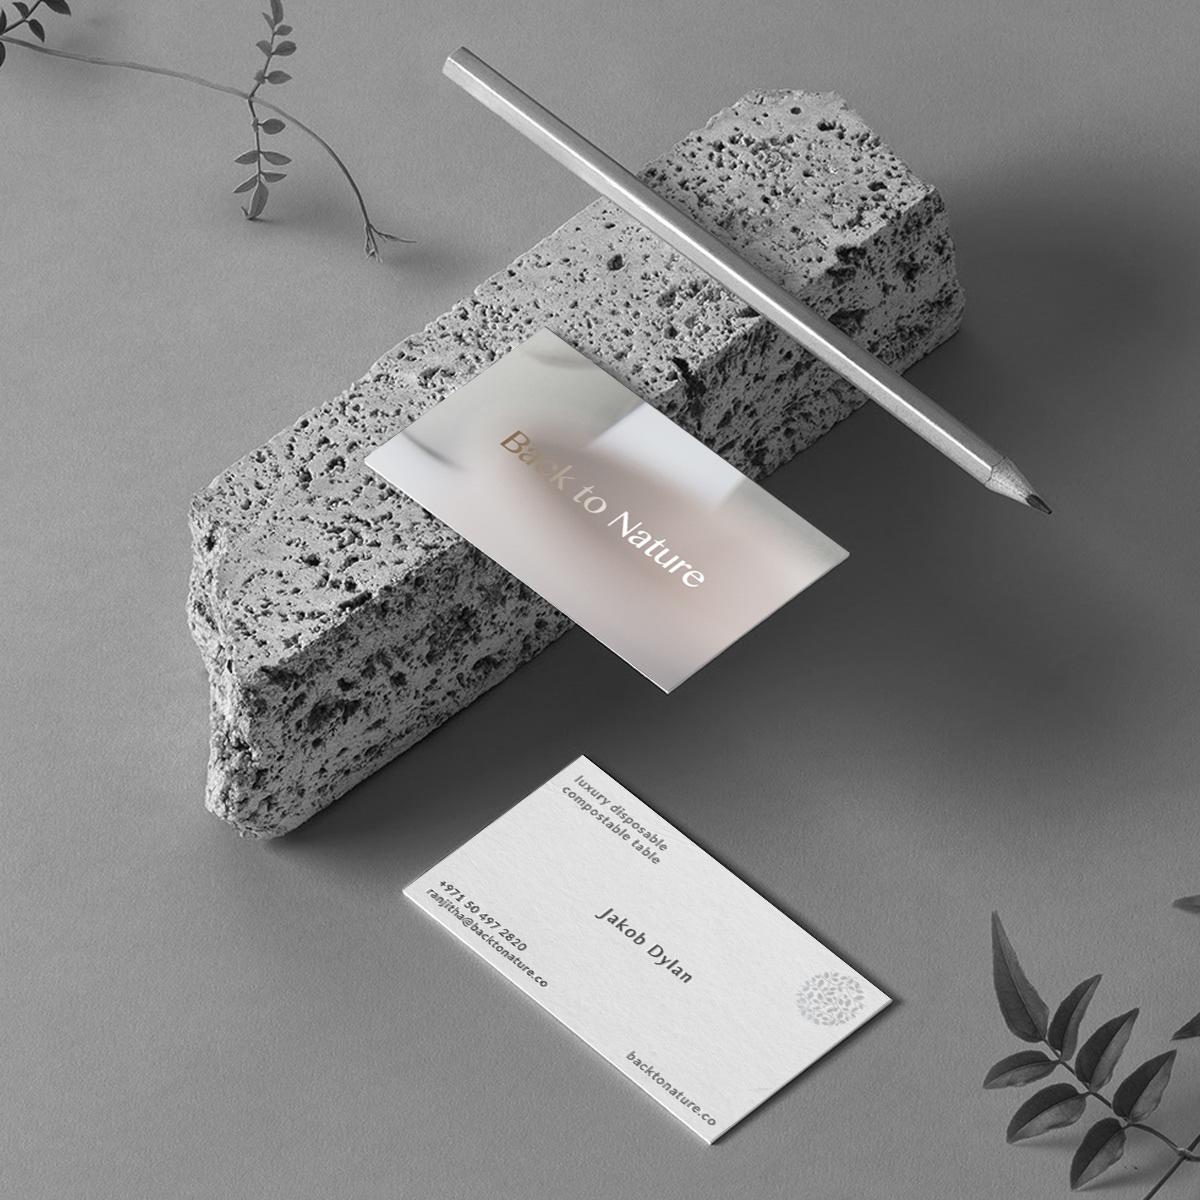 Minimal vitisting card design for back to nature